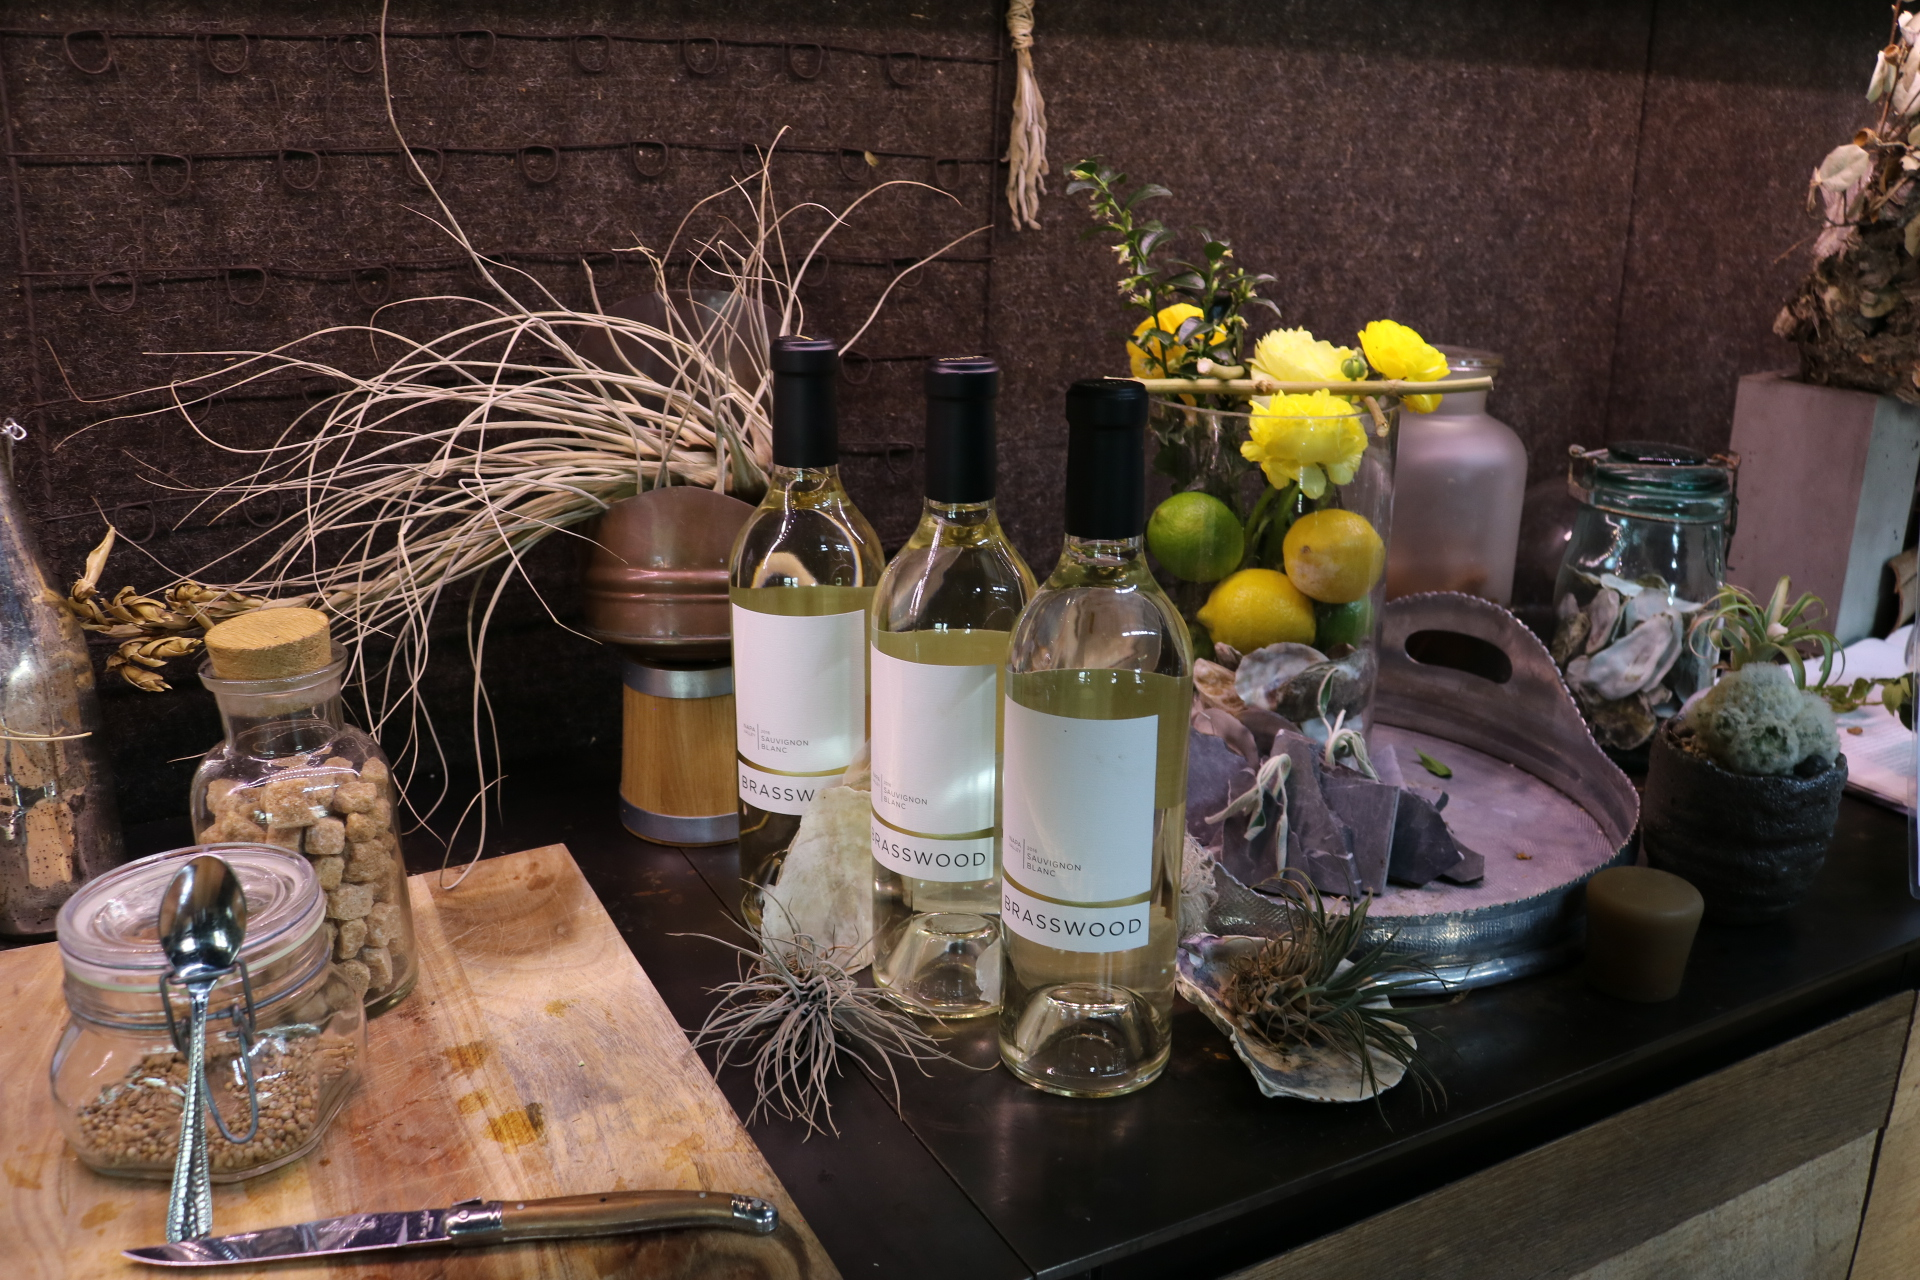 brasswood-napa-winery